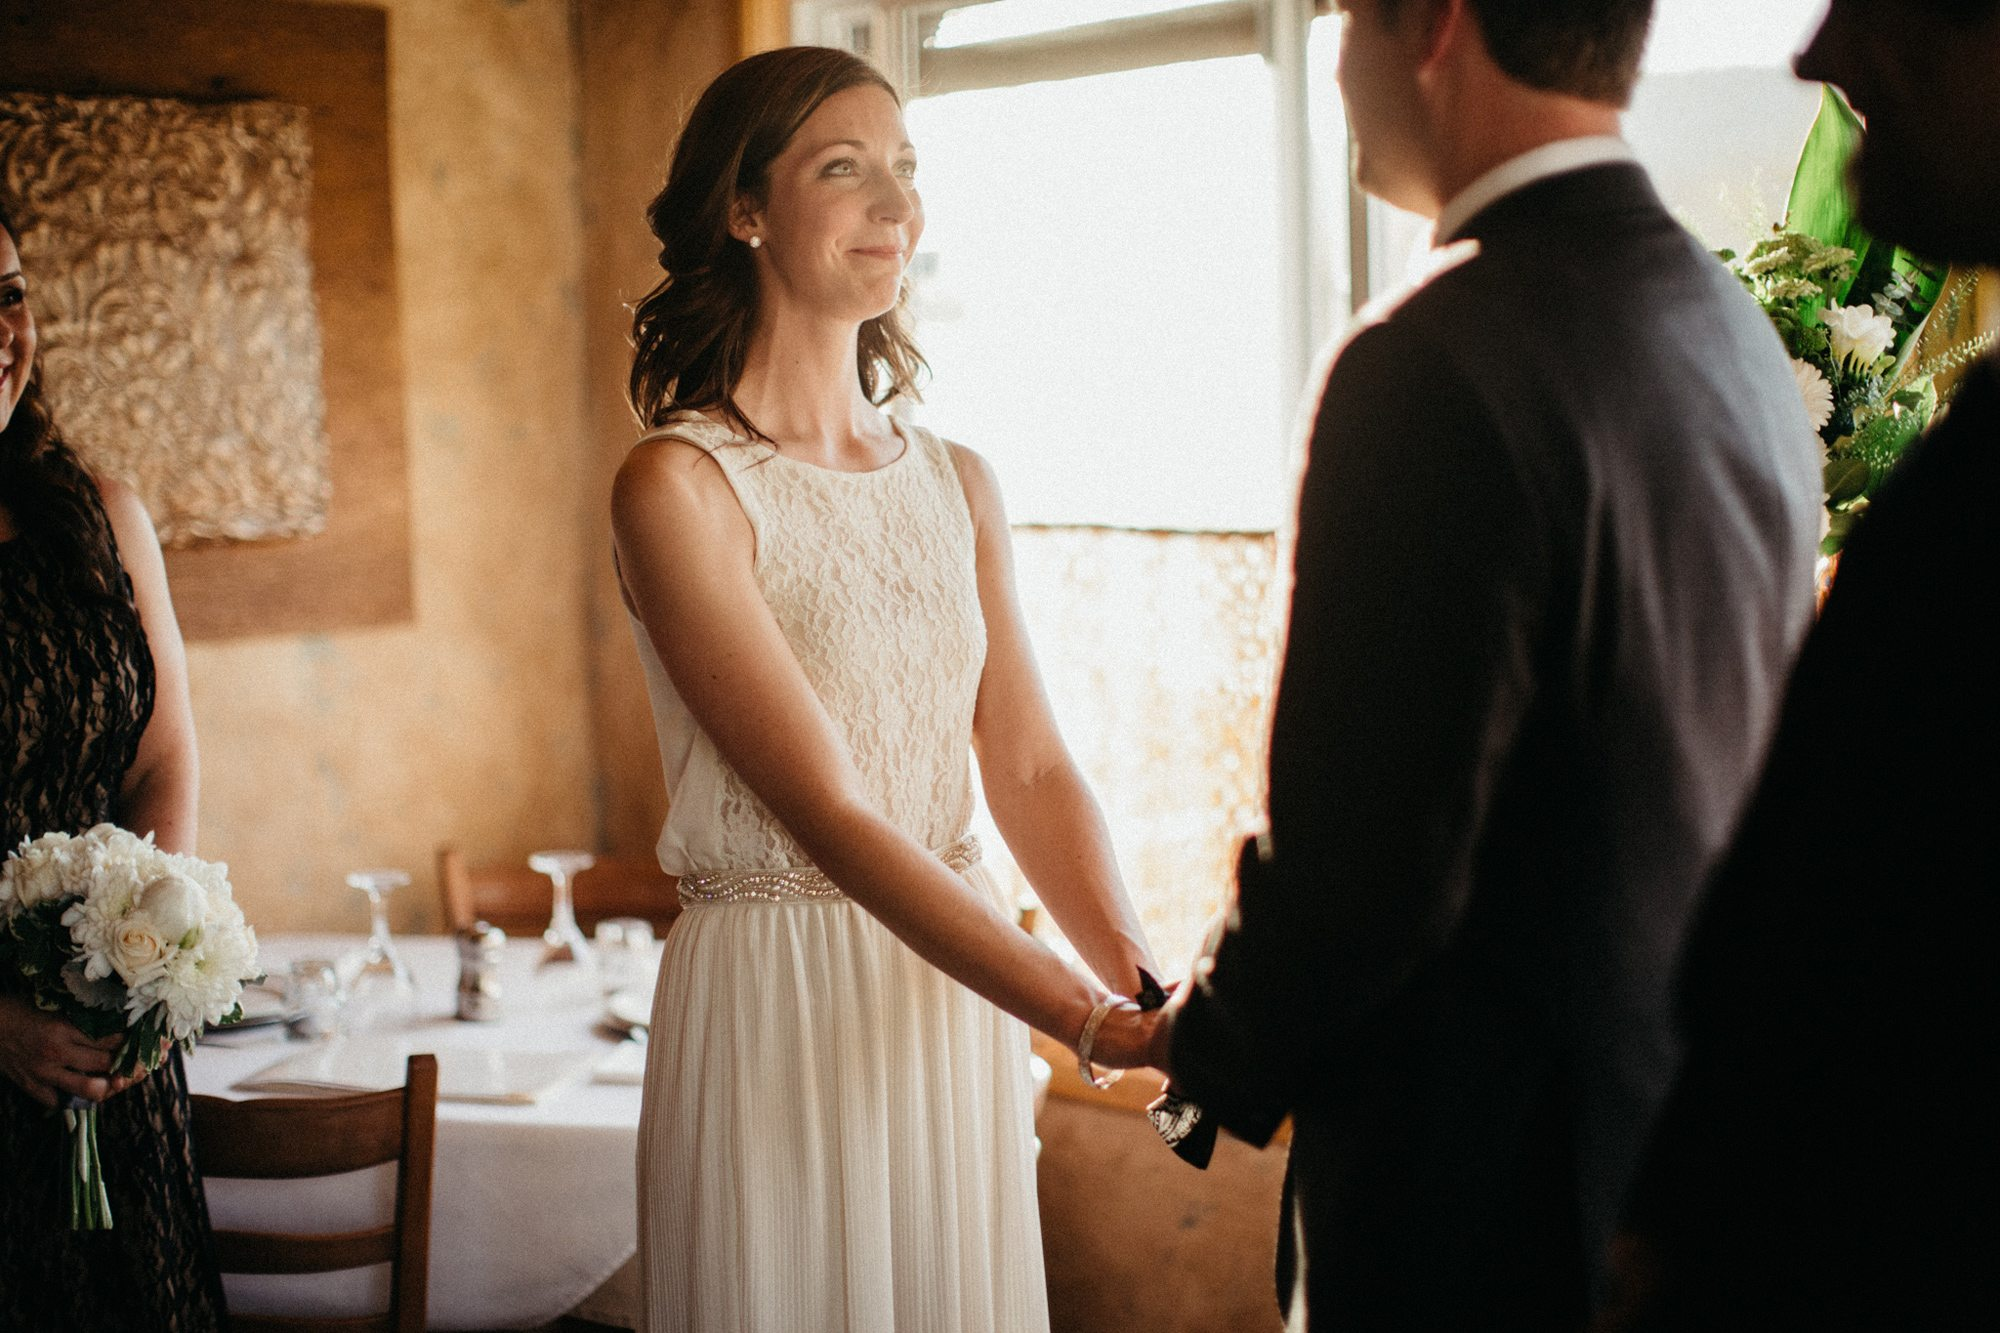 914-vancouver-elopement-photographer